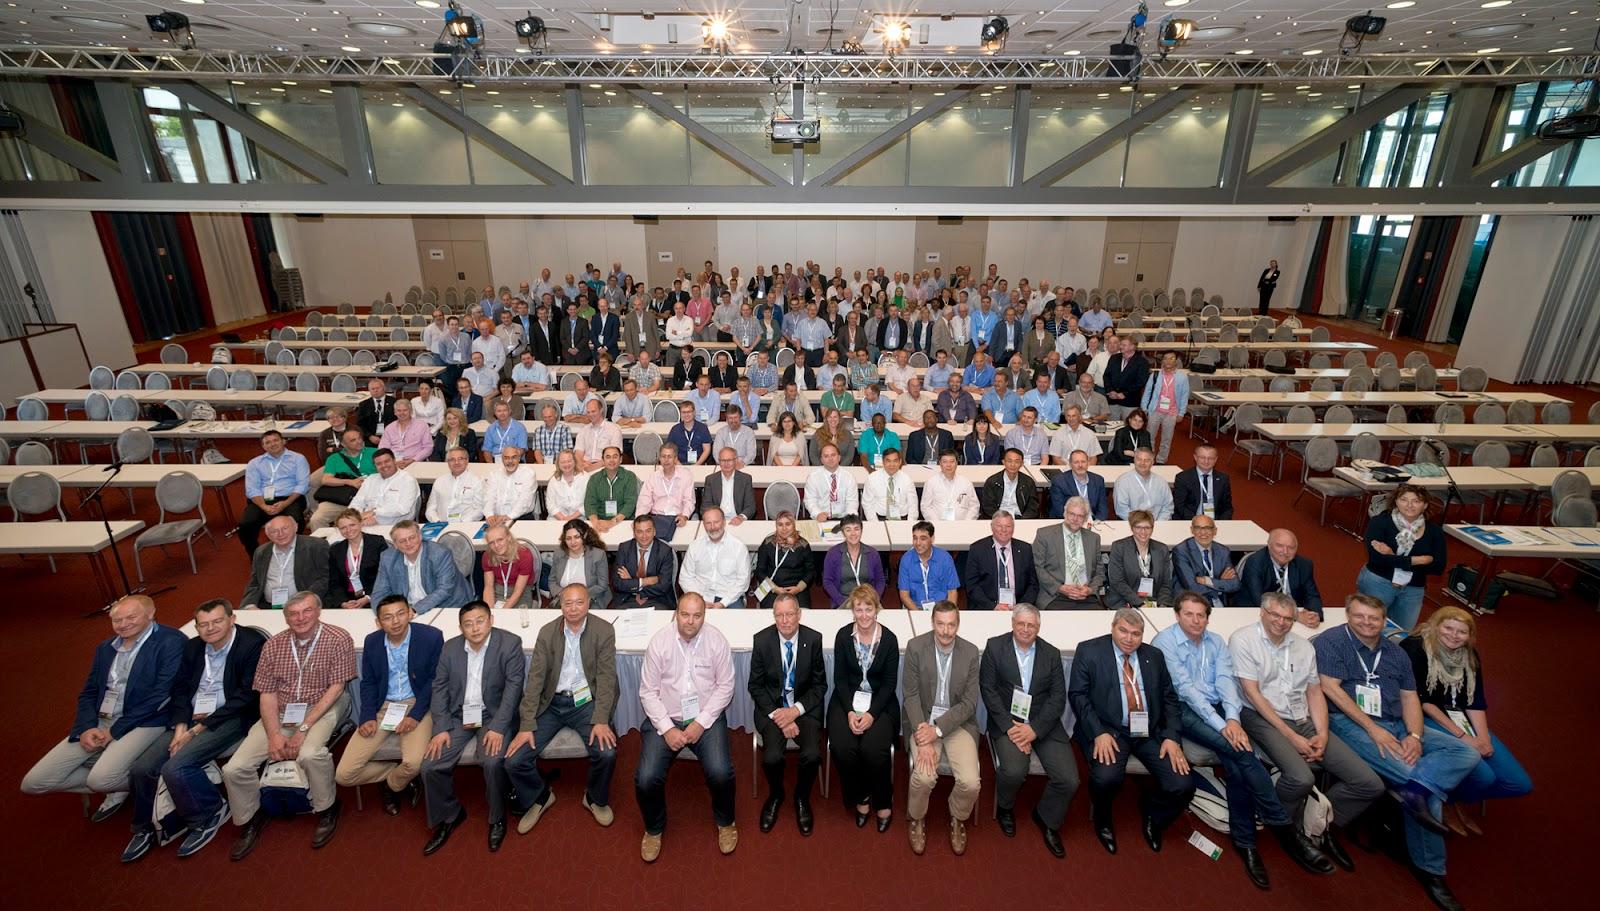 Interbull Meetings Berlin Germany 2014 Interbull Hall Of Fame